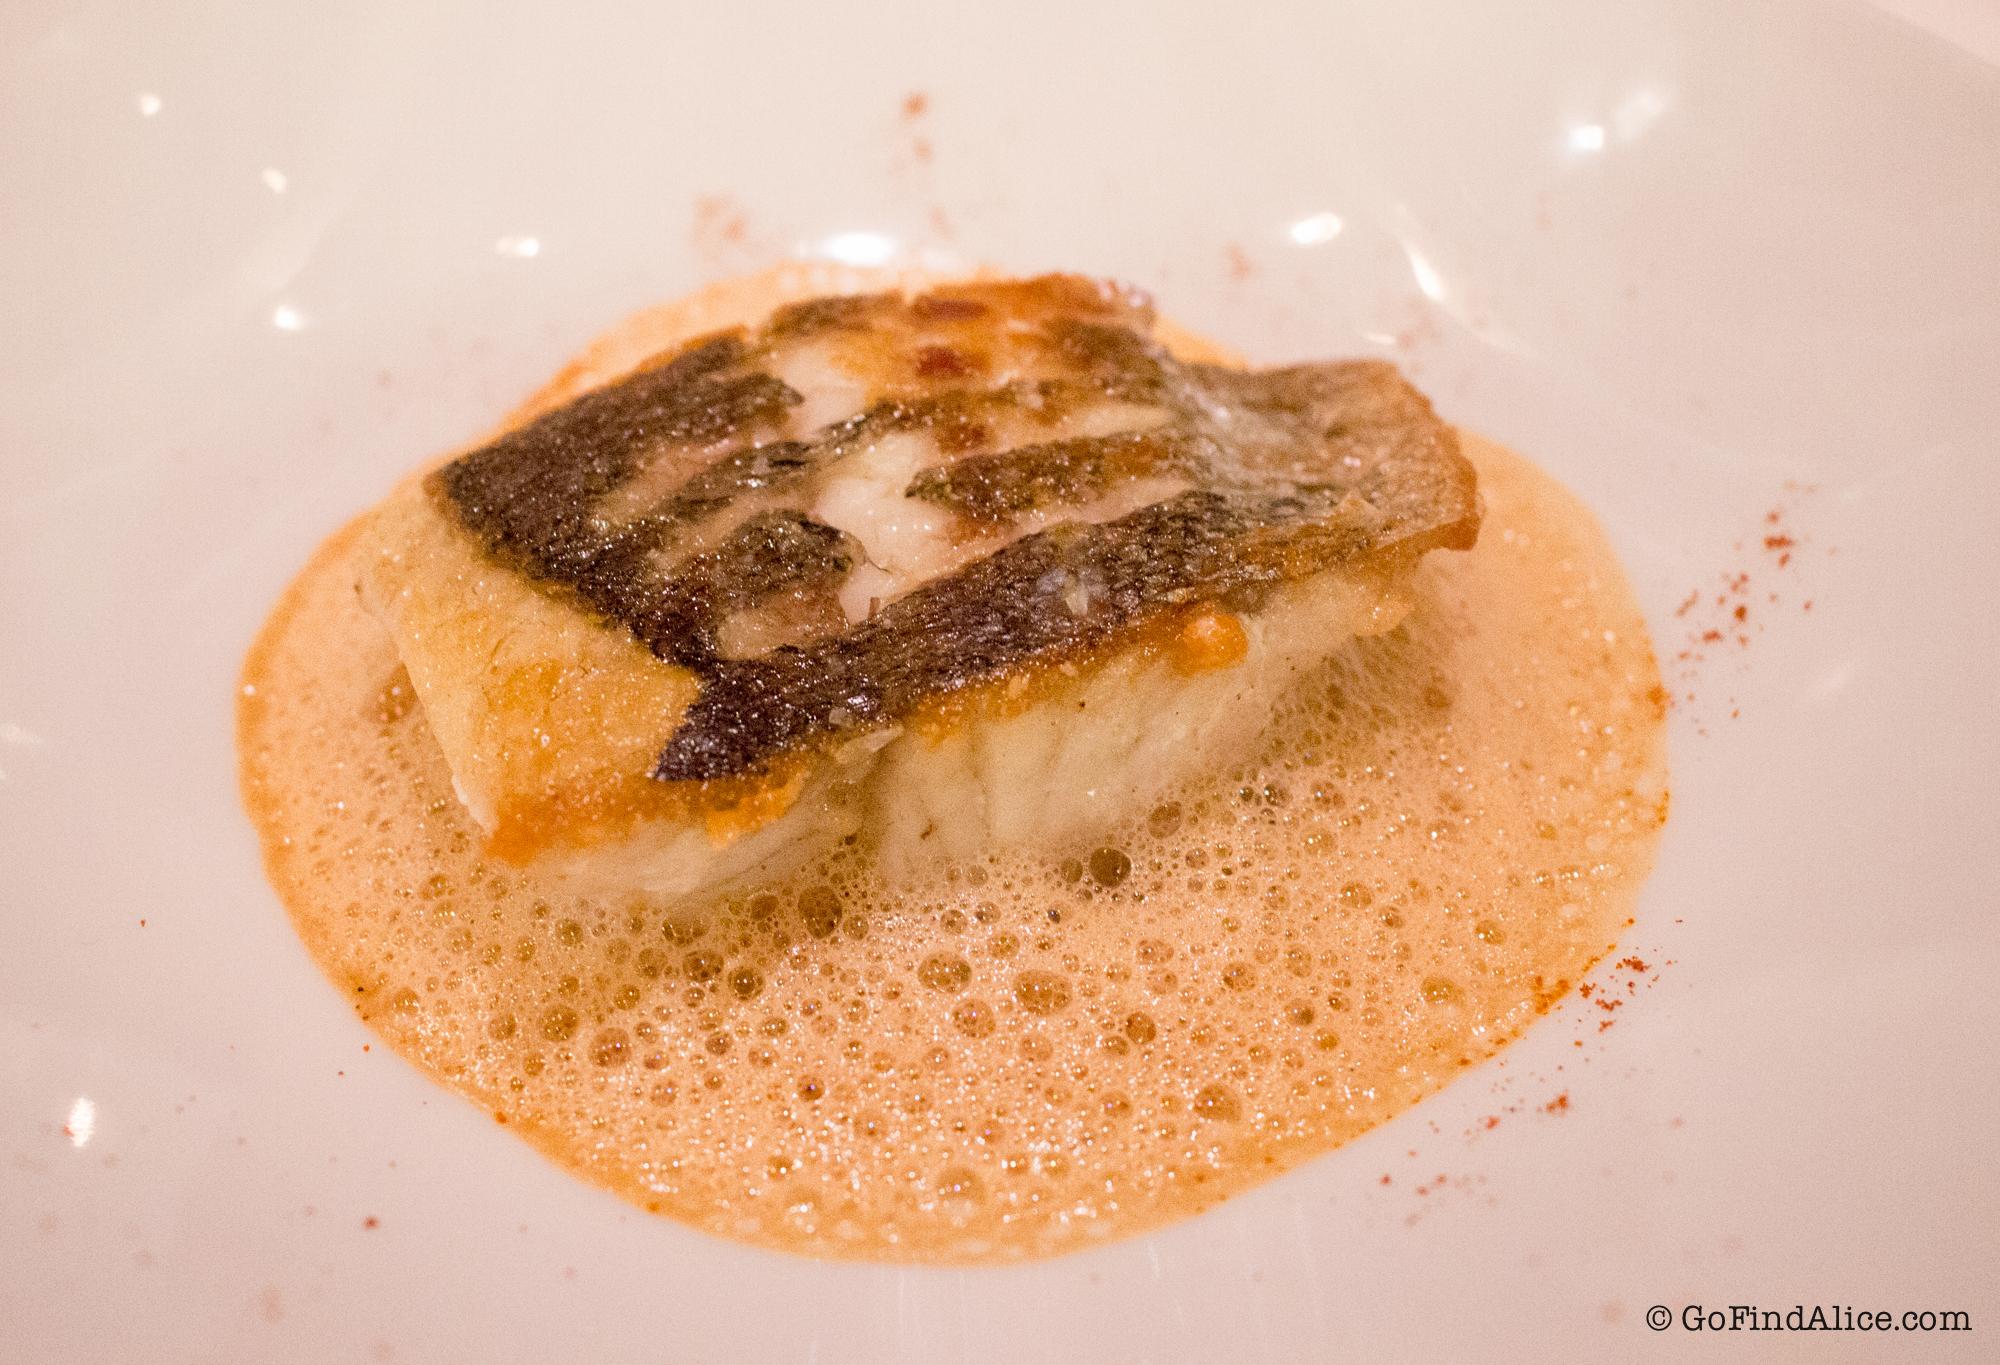 Pan roasted sea bass with lobster emulsion [嫩煎鲈鱼配龙虾泡沫汁]